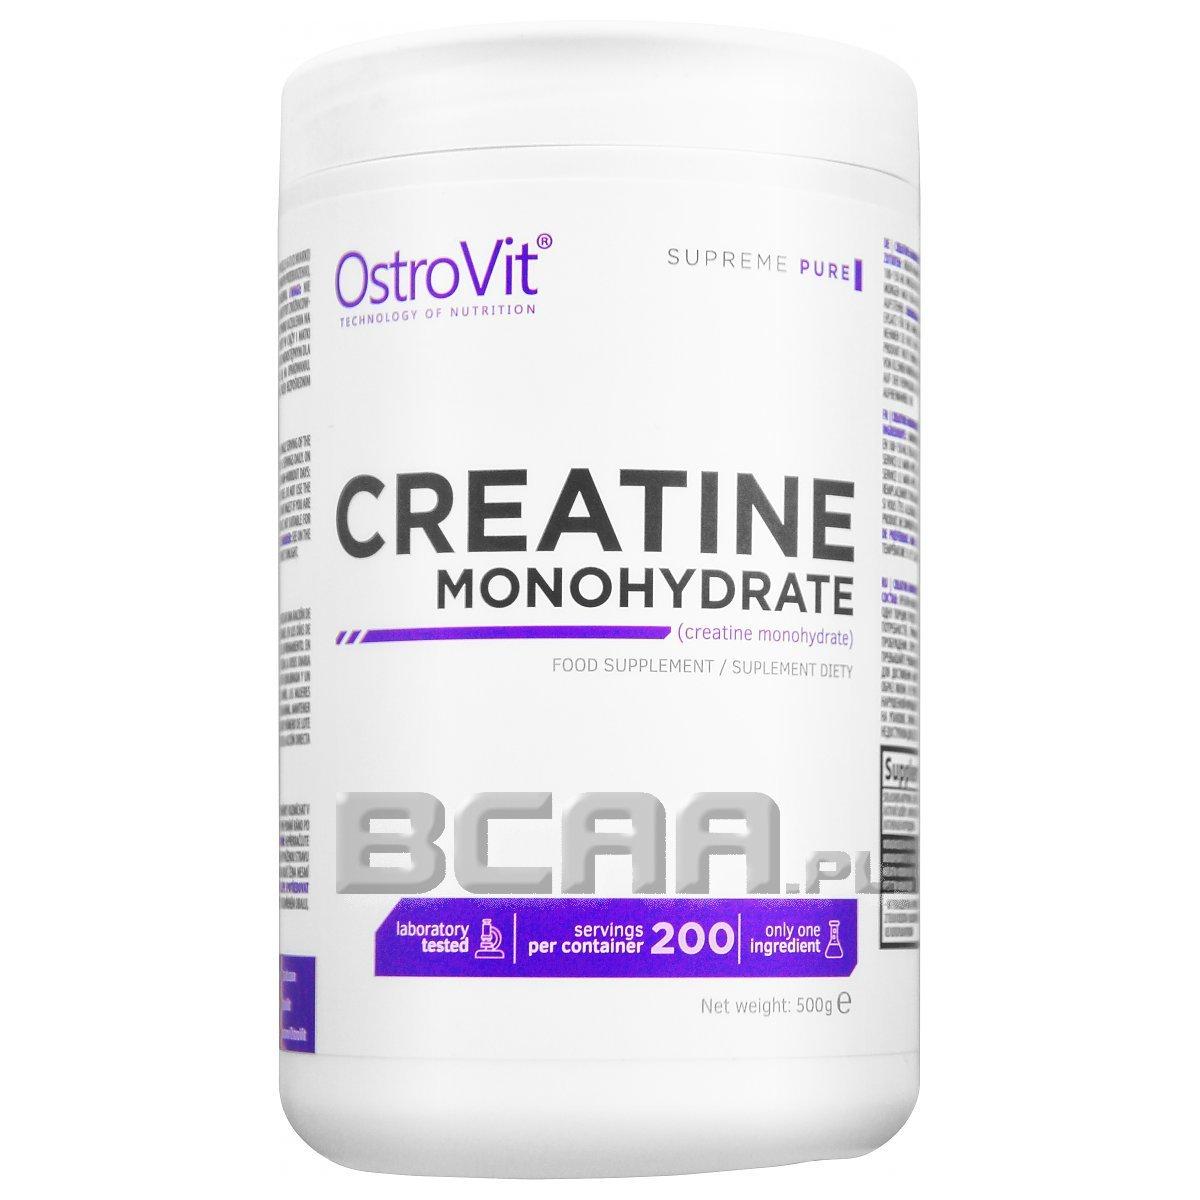 c67fa43567a5 Supreme Pure Monohydrate Creatine OstroVit 500g • Sklep BCAA.pl